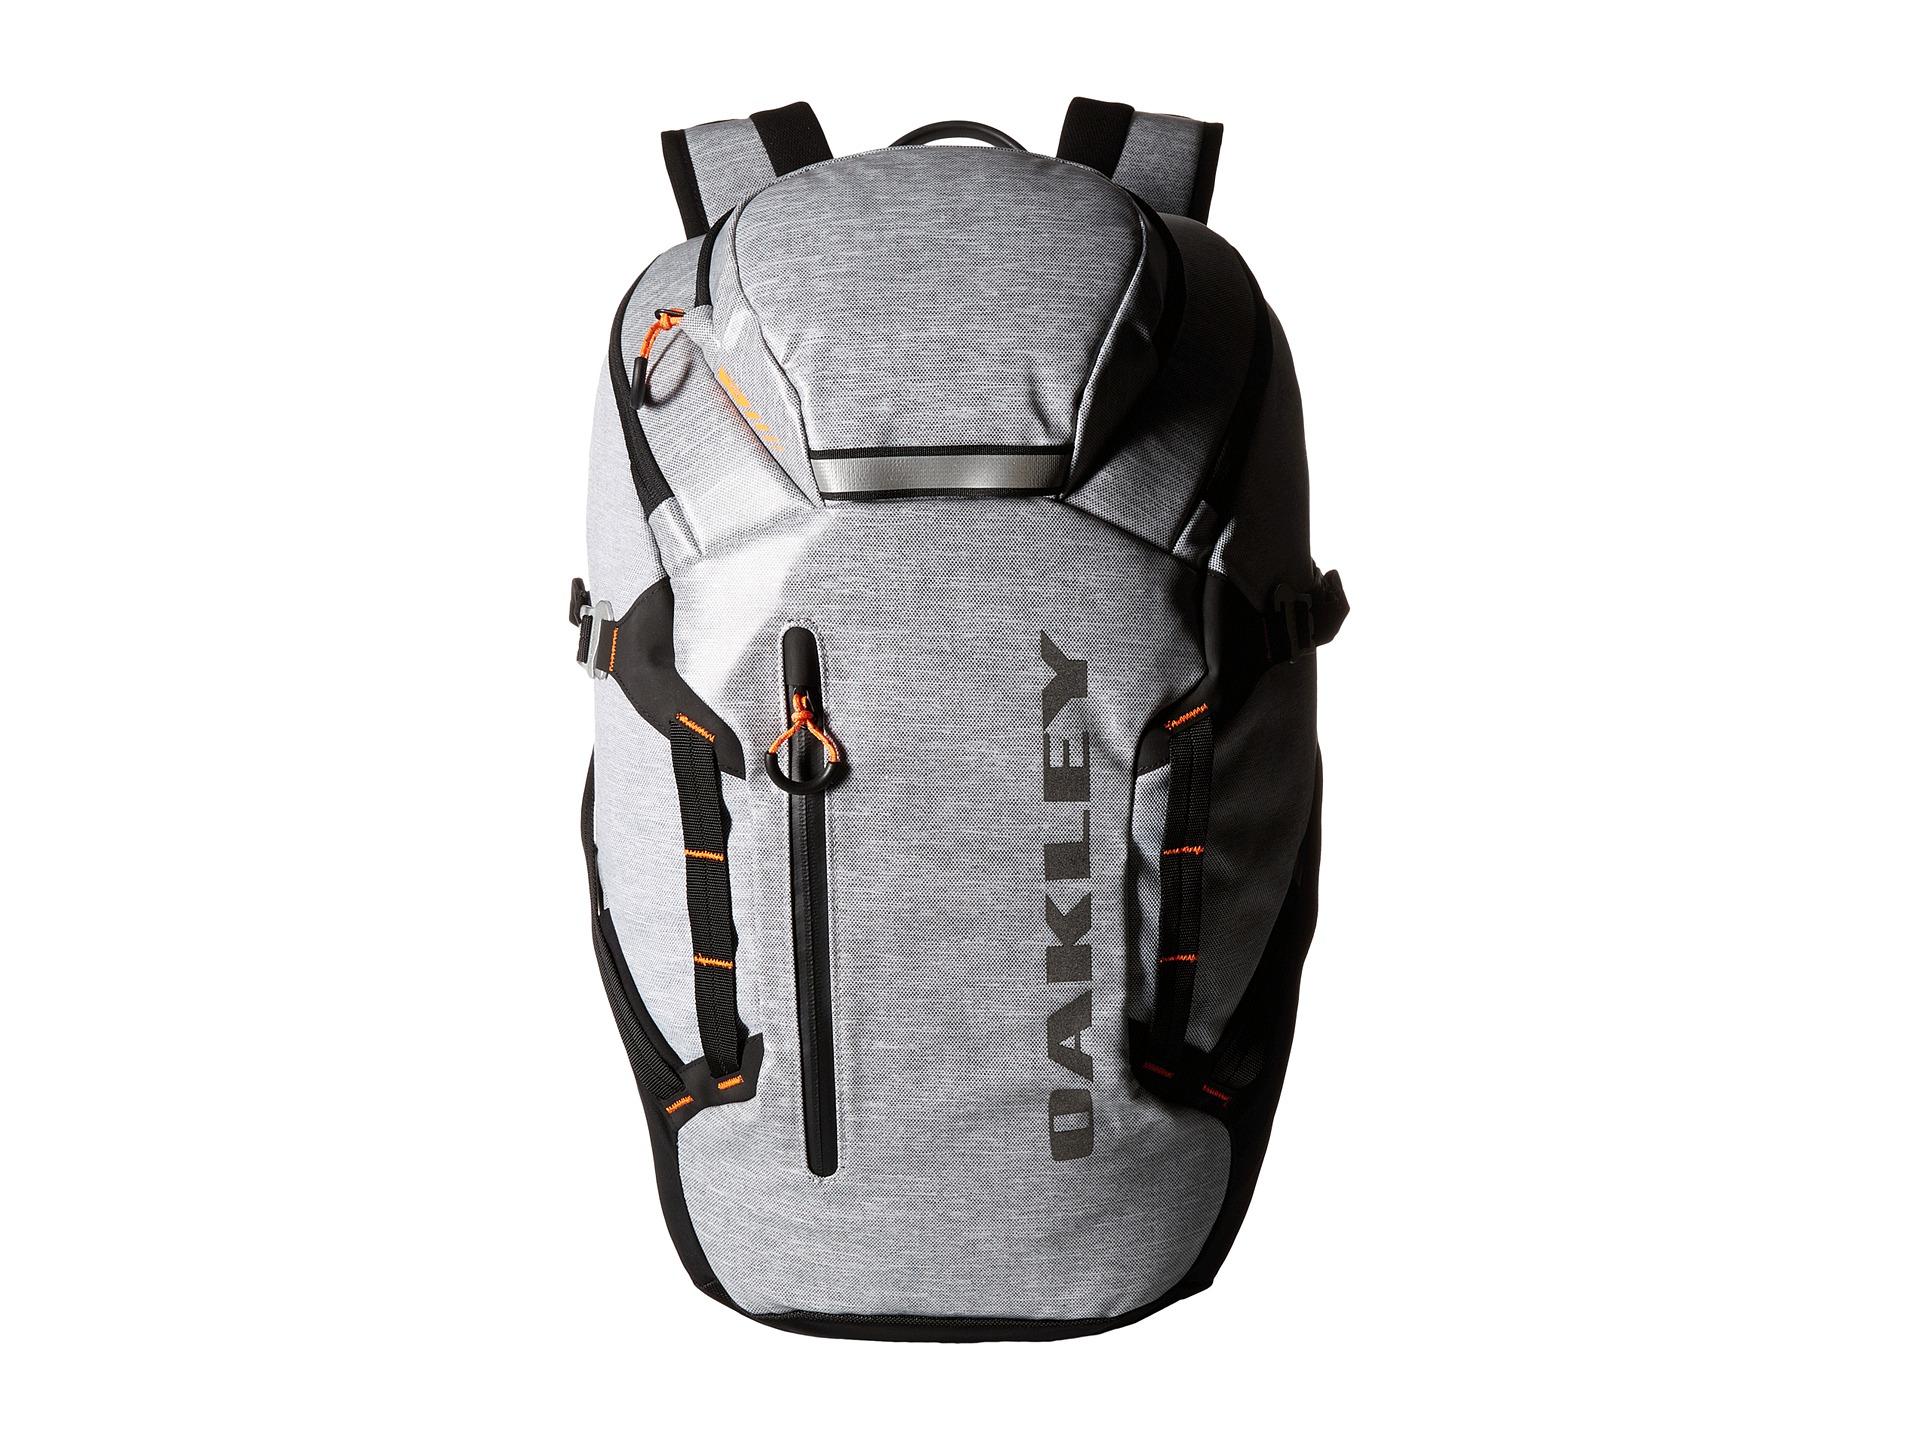 Lyst - Oakley Voyage 27 Pack in Gray for Men